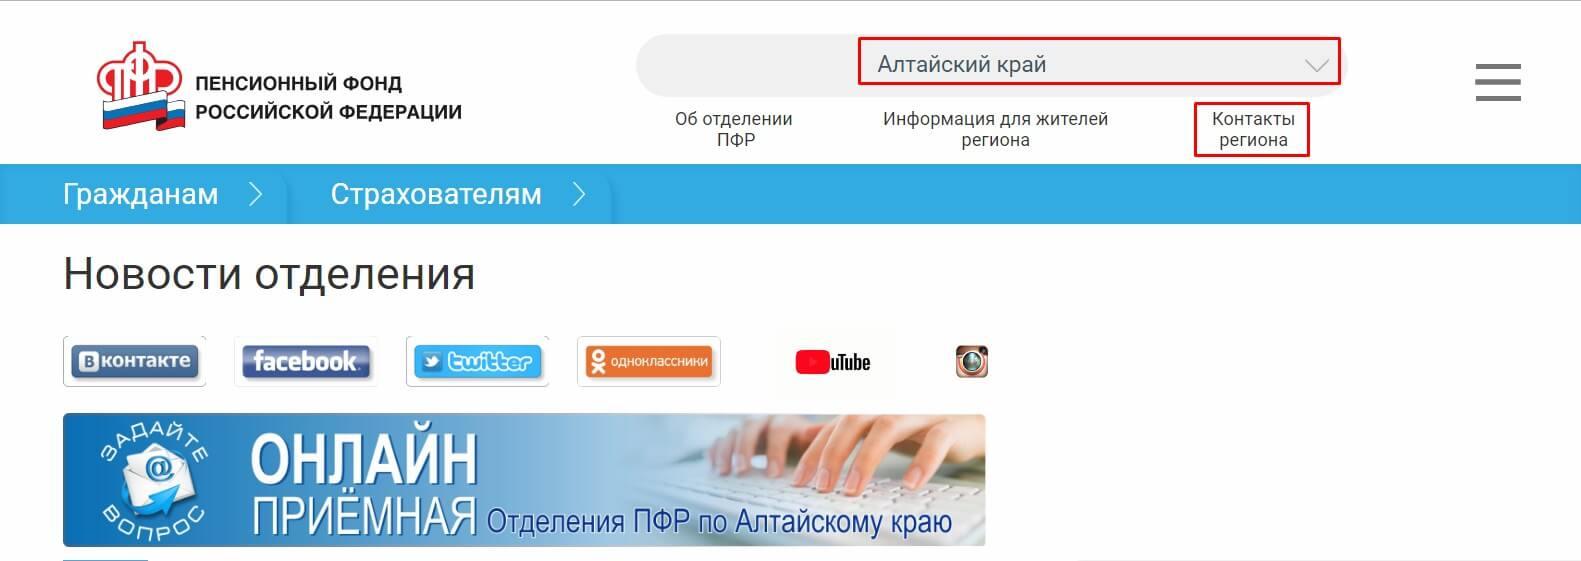 Пенсионный фонд Алтайского района